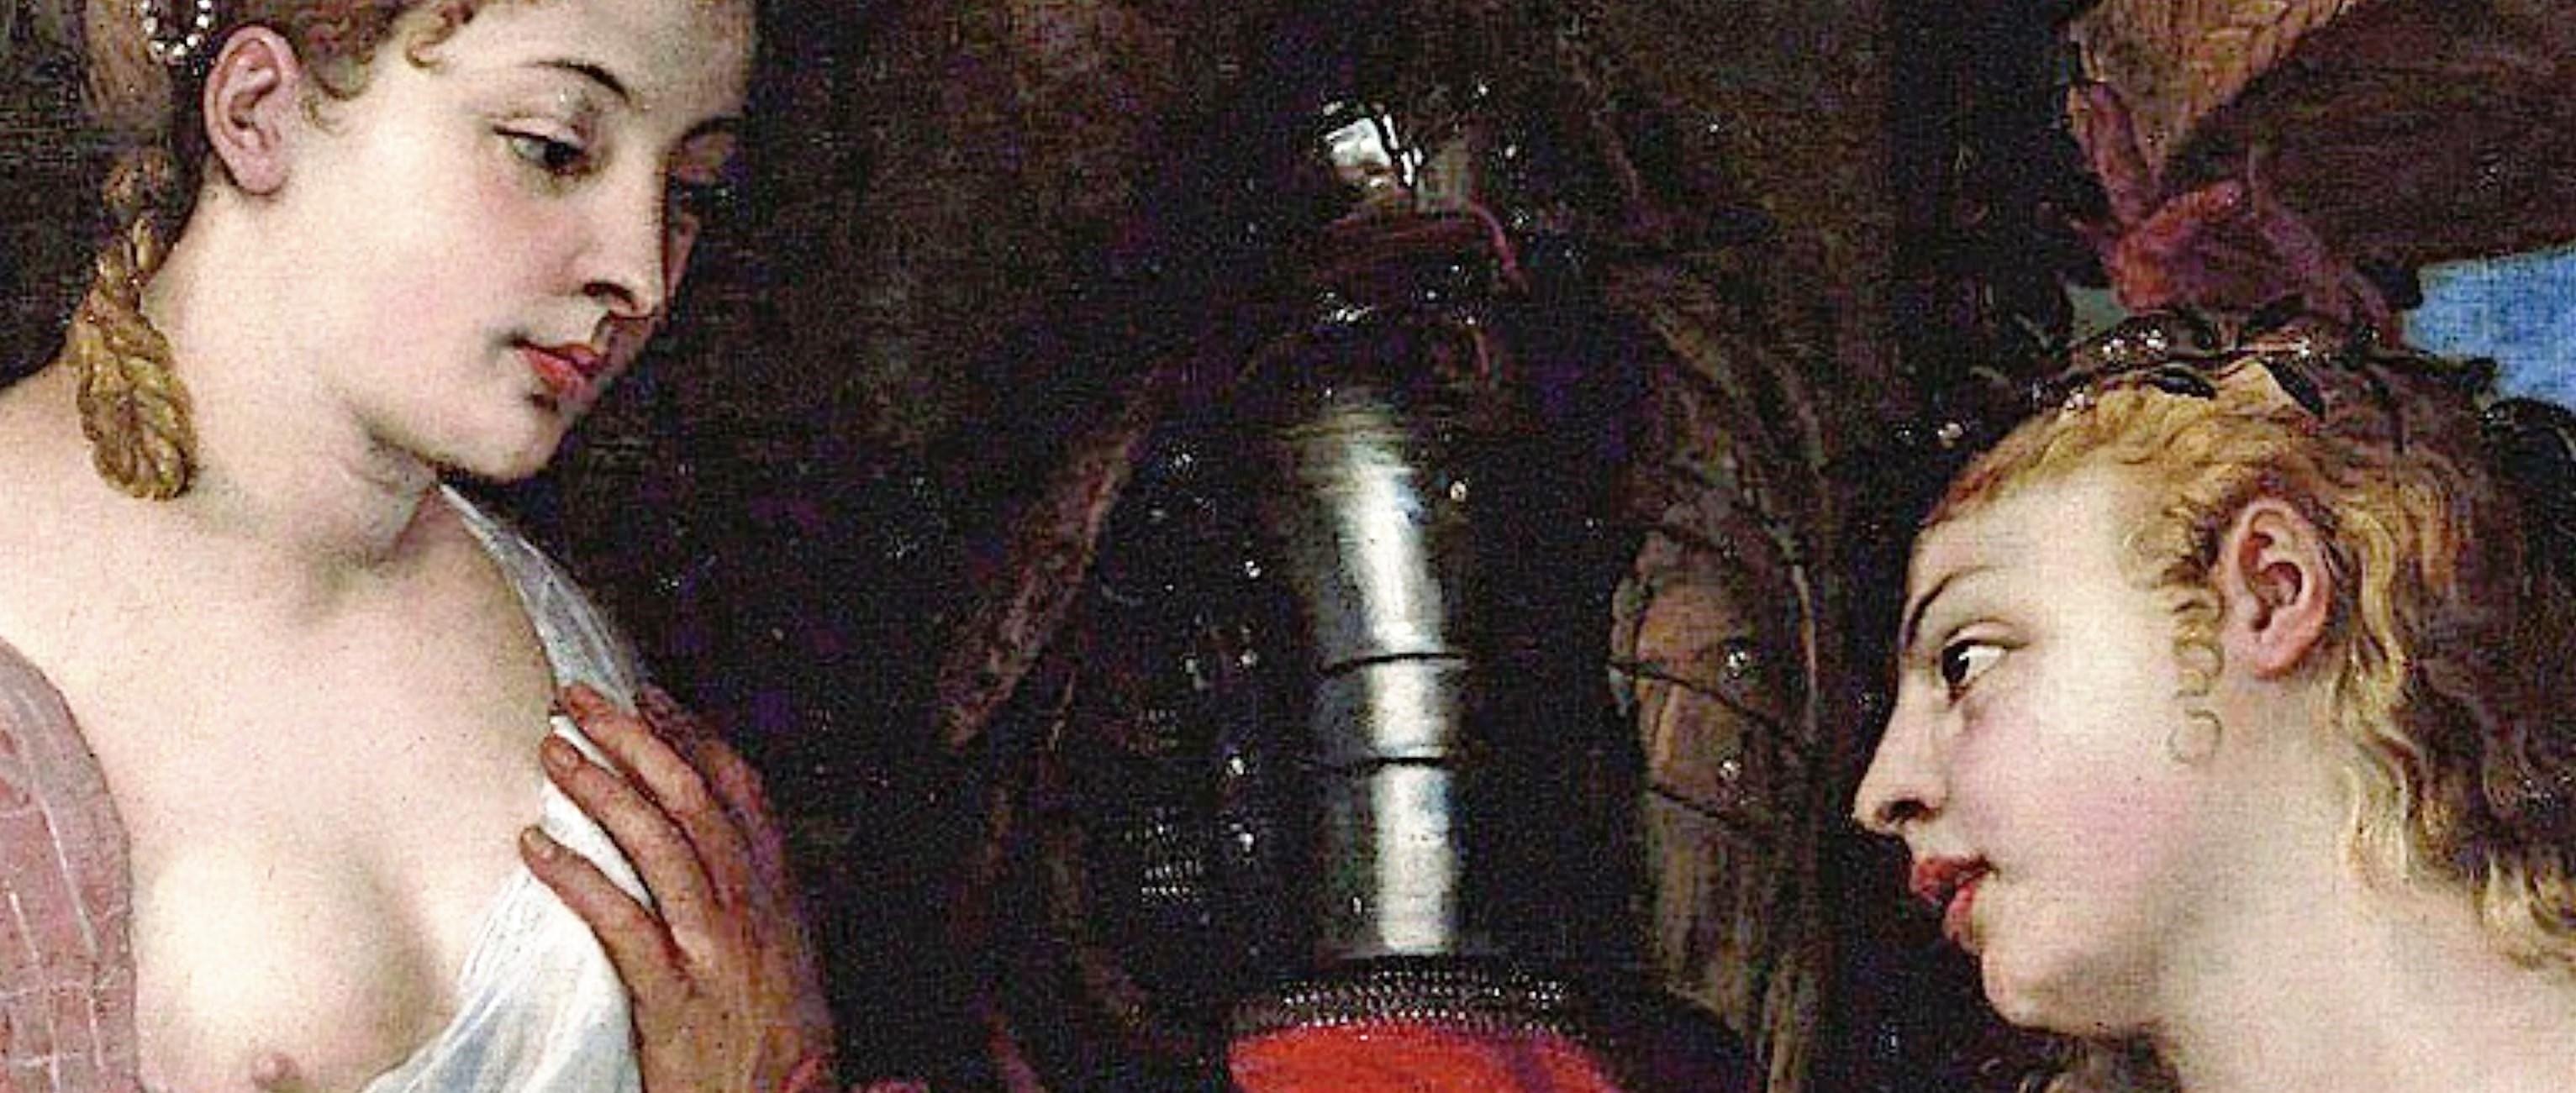 Titien 1530 ca Allegorie conjugale, dite a tort Allegorie d'Alphonse d'Avalos Louvre detail